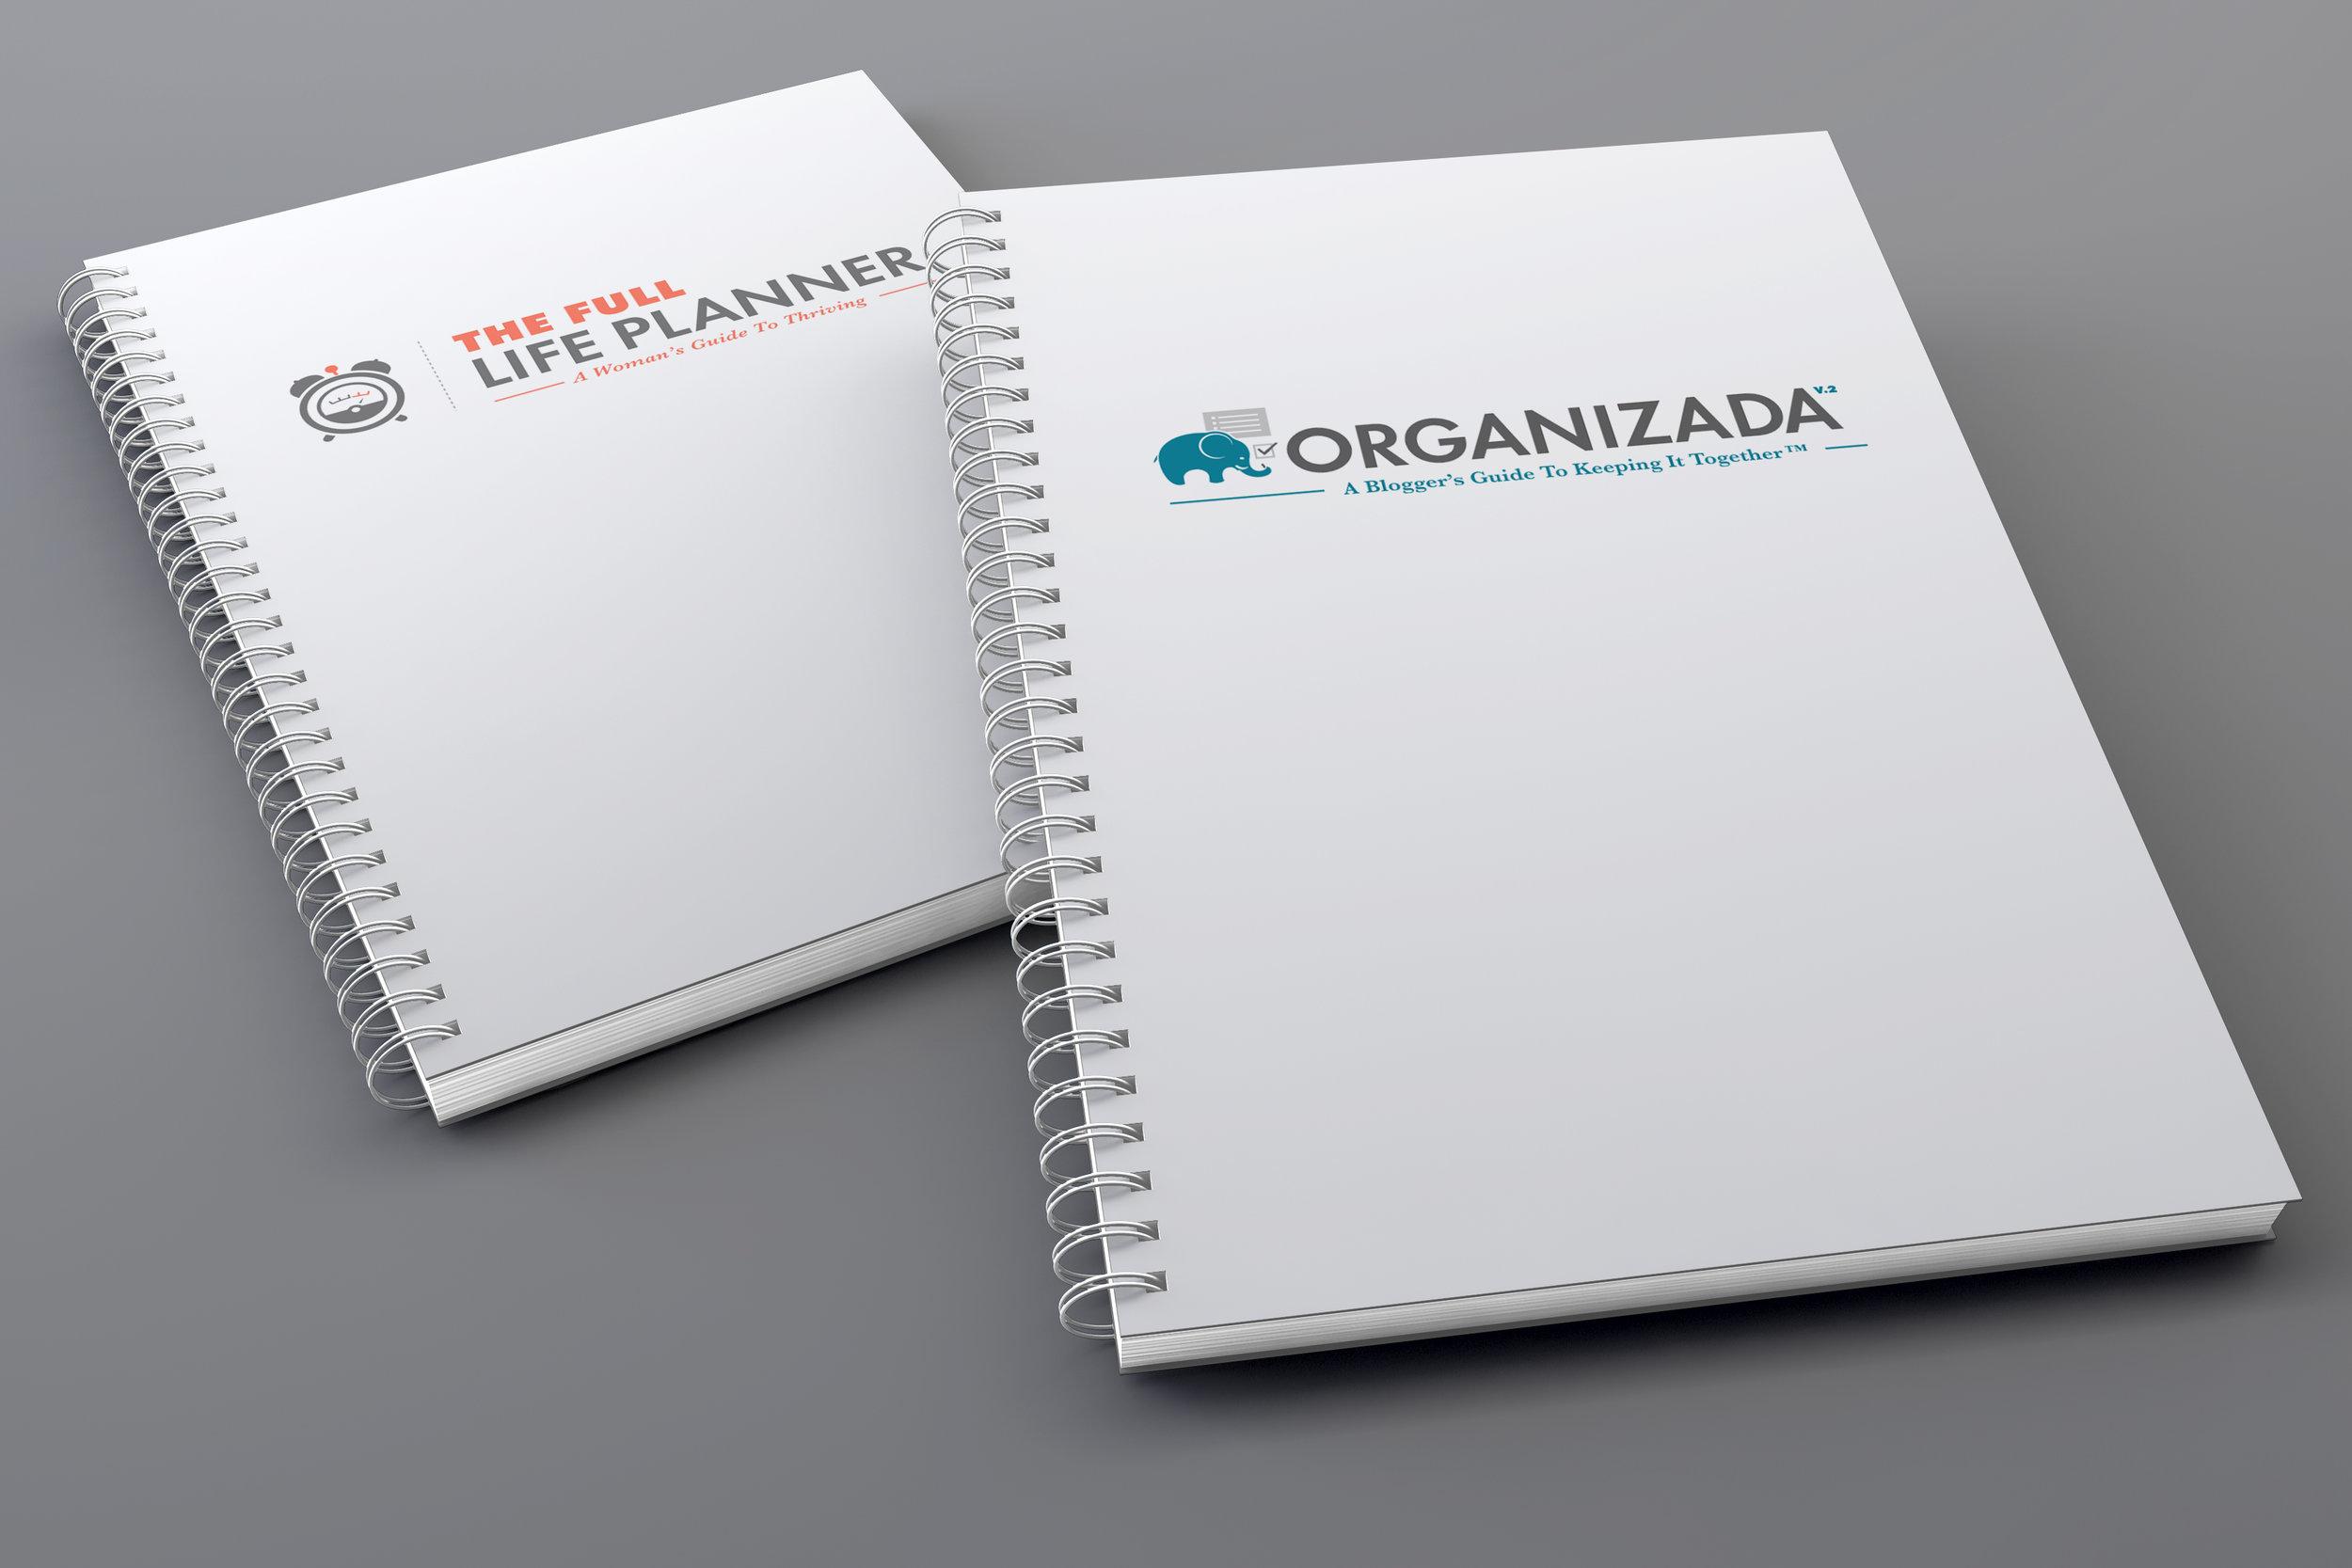 Organizada-Full_life.jpg